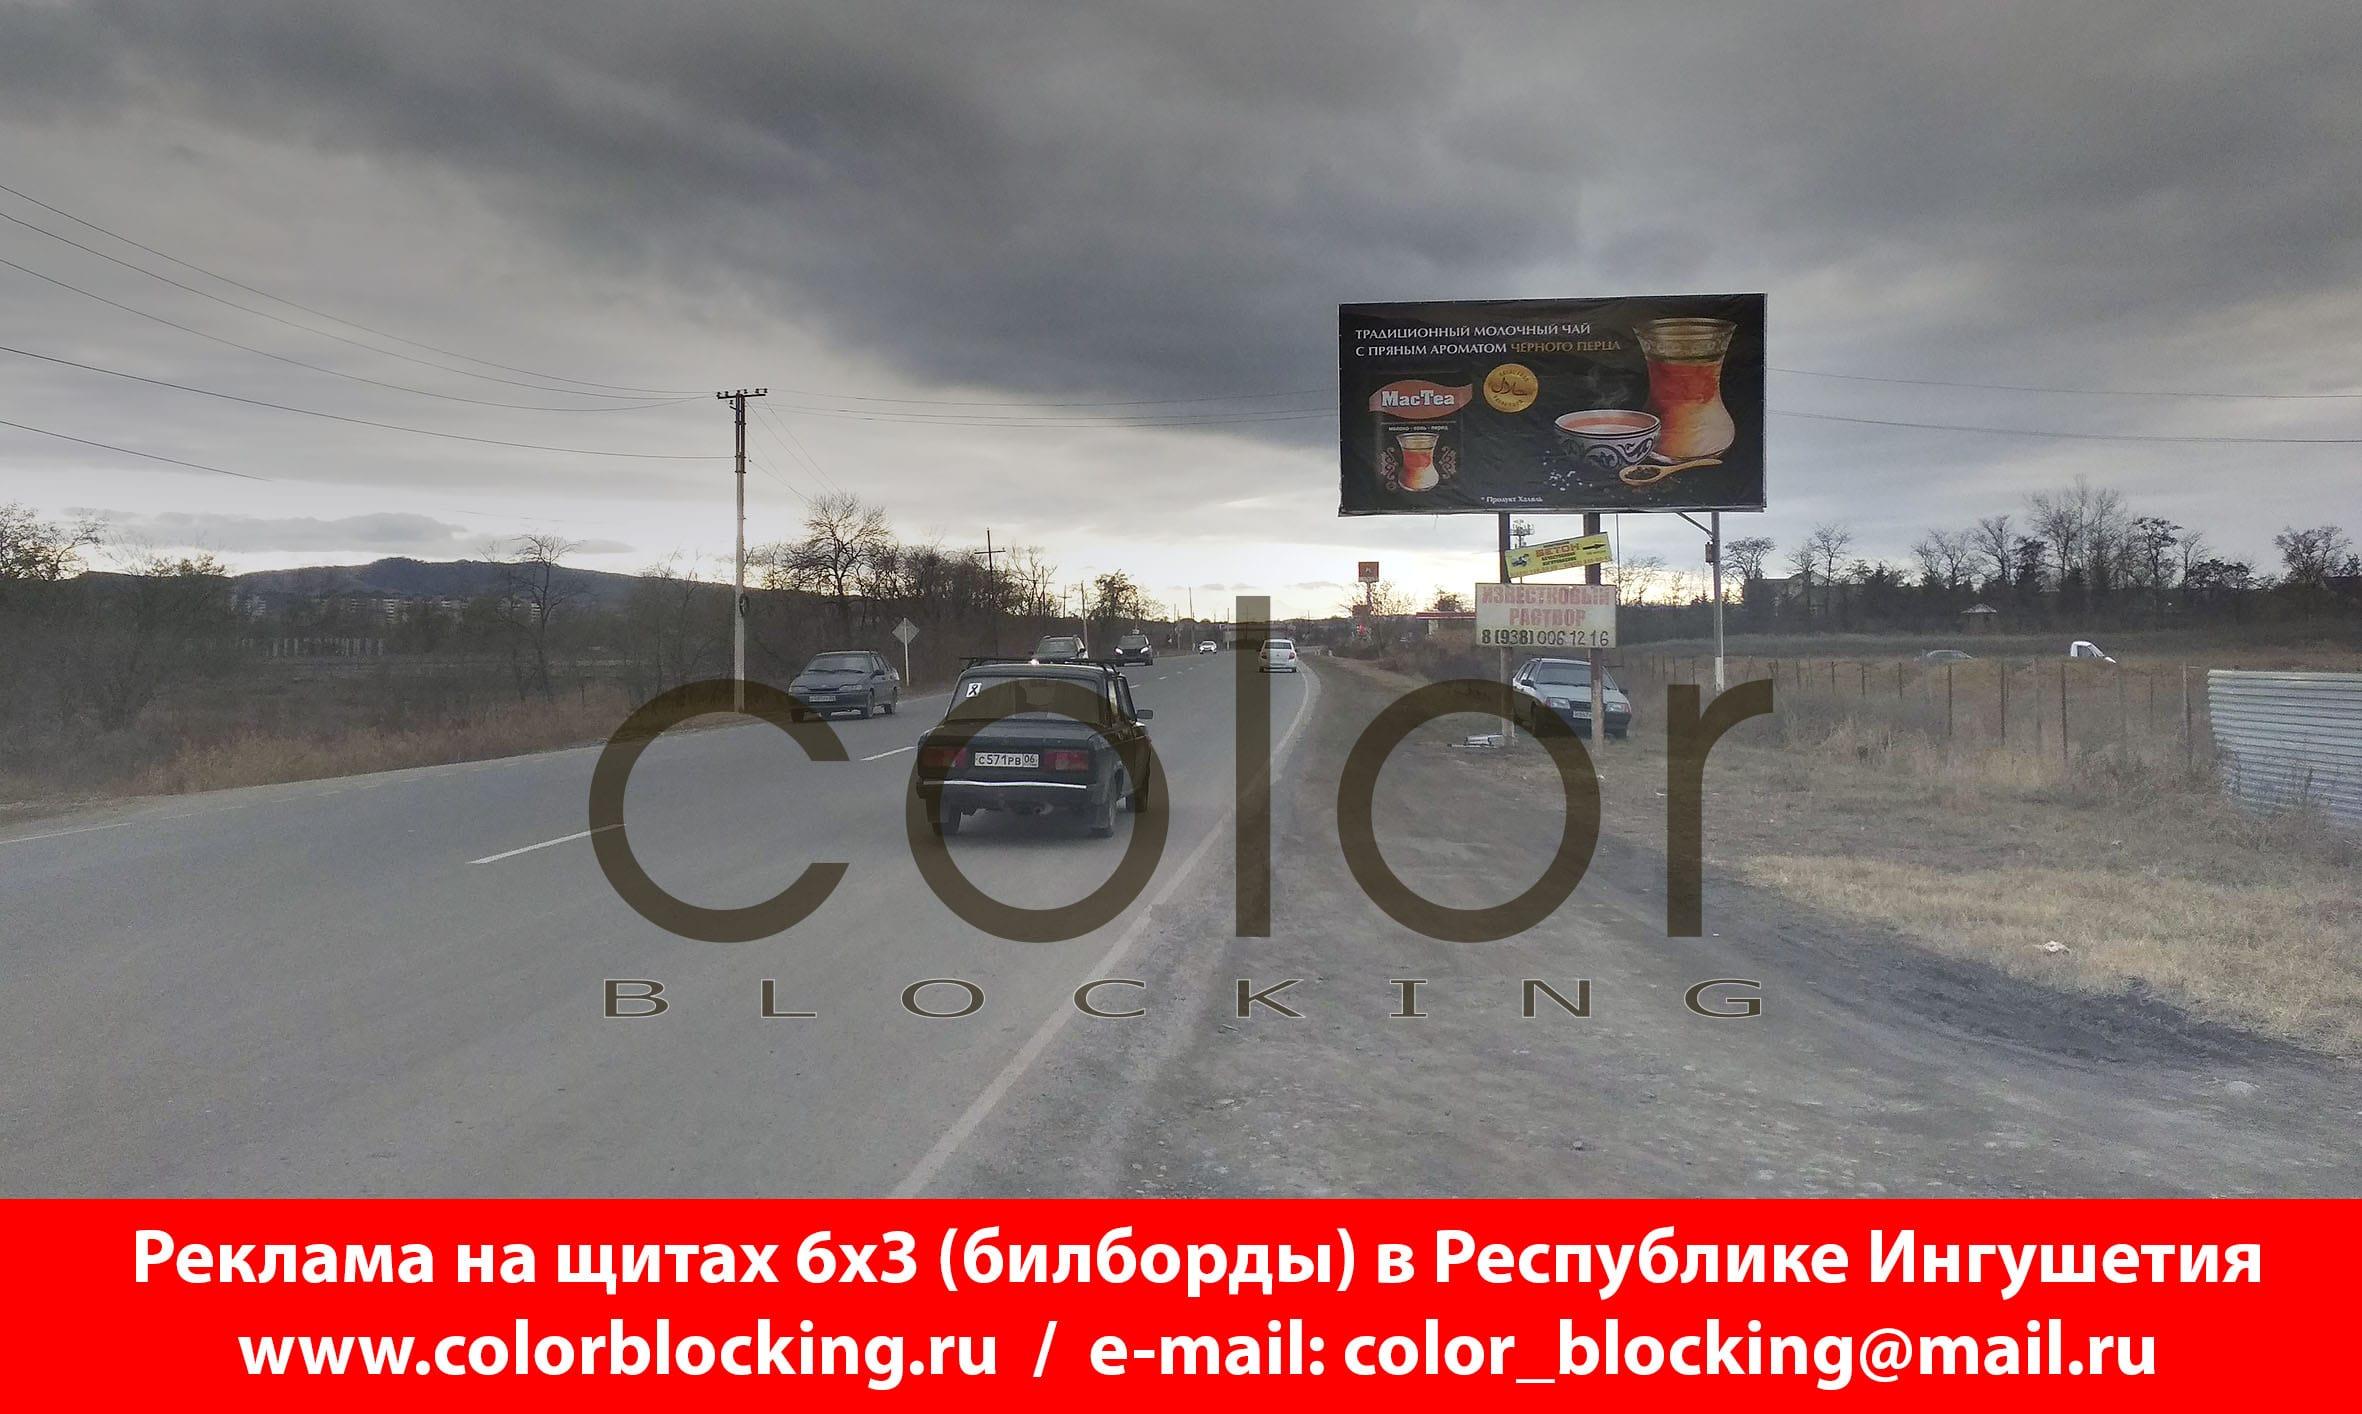 Реклама в Ингушетии на щитах 6х3 уличная